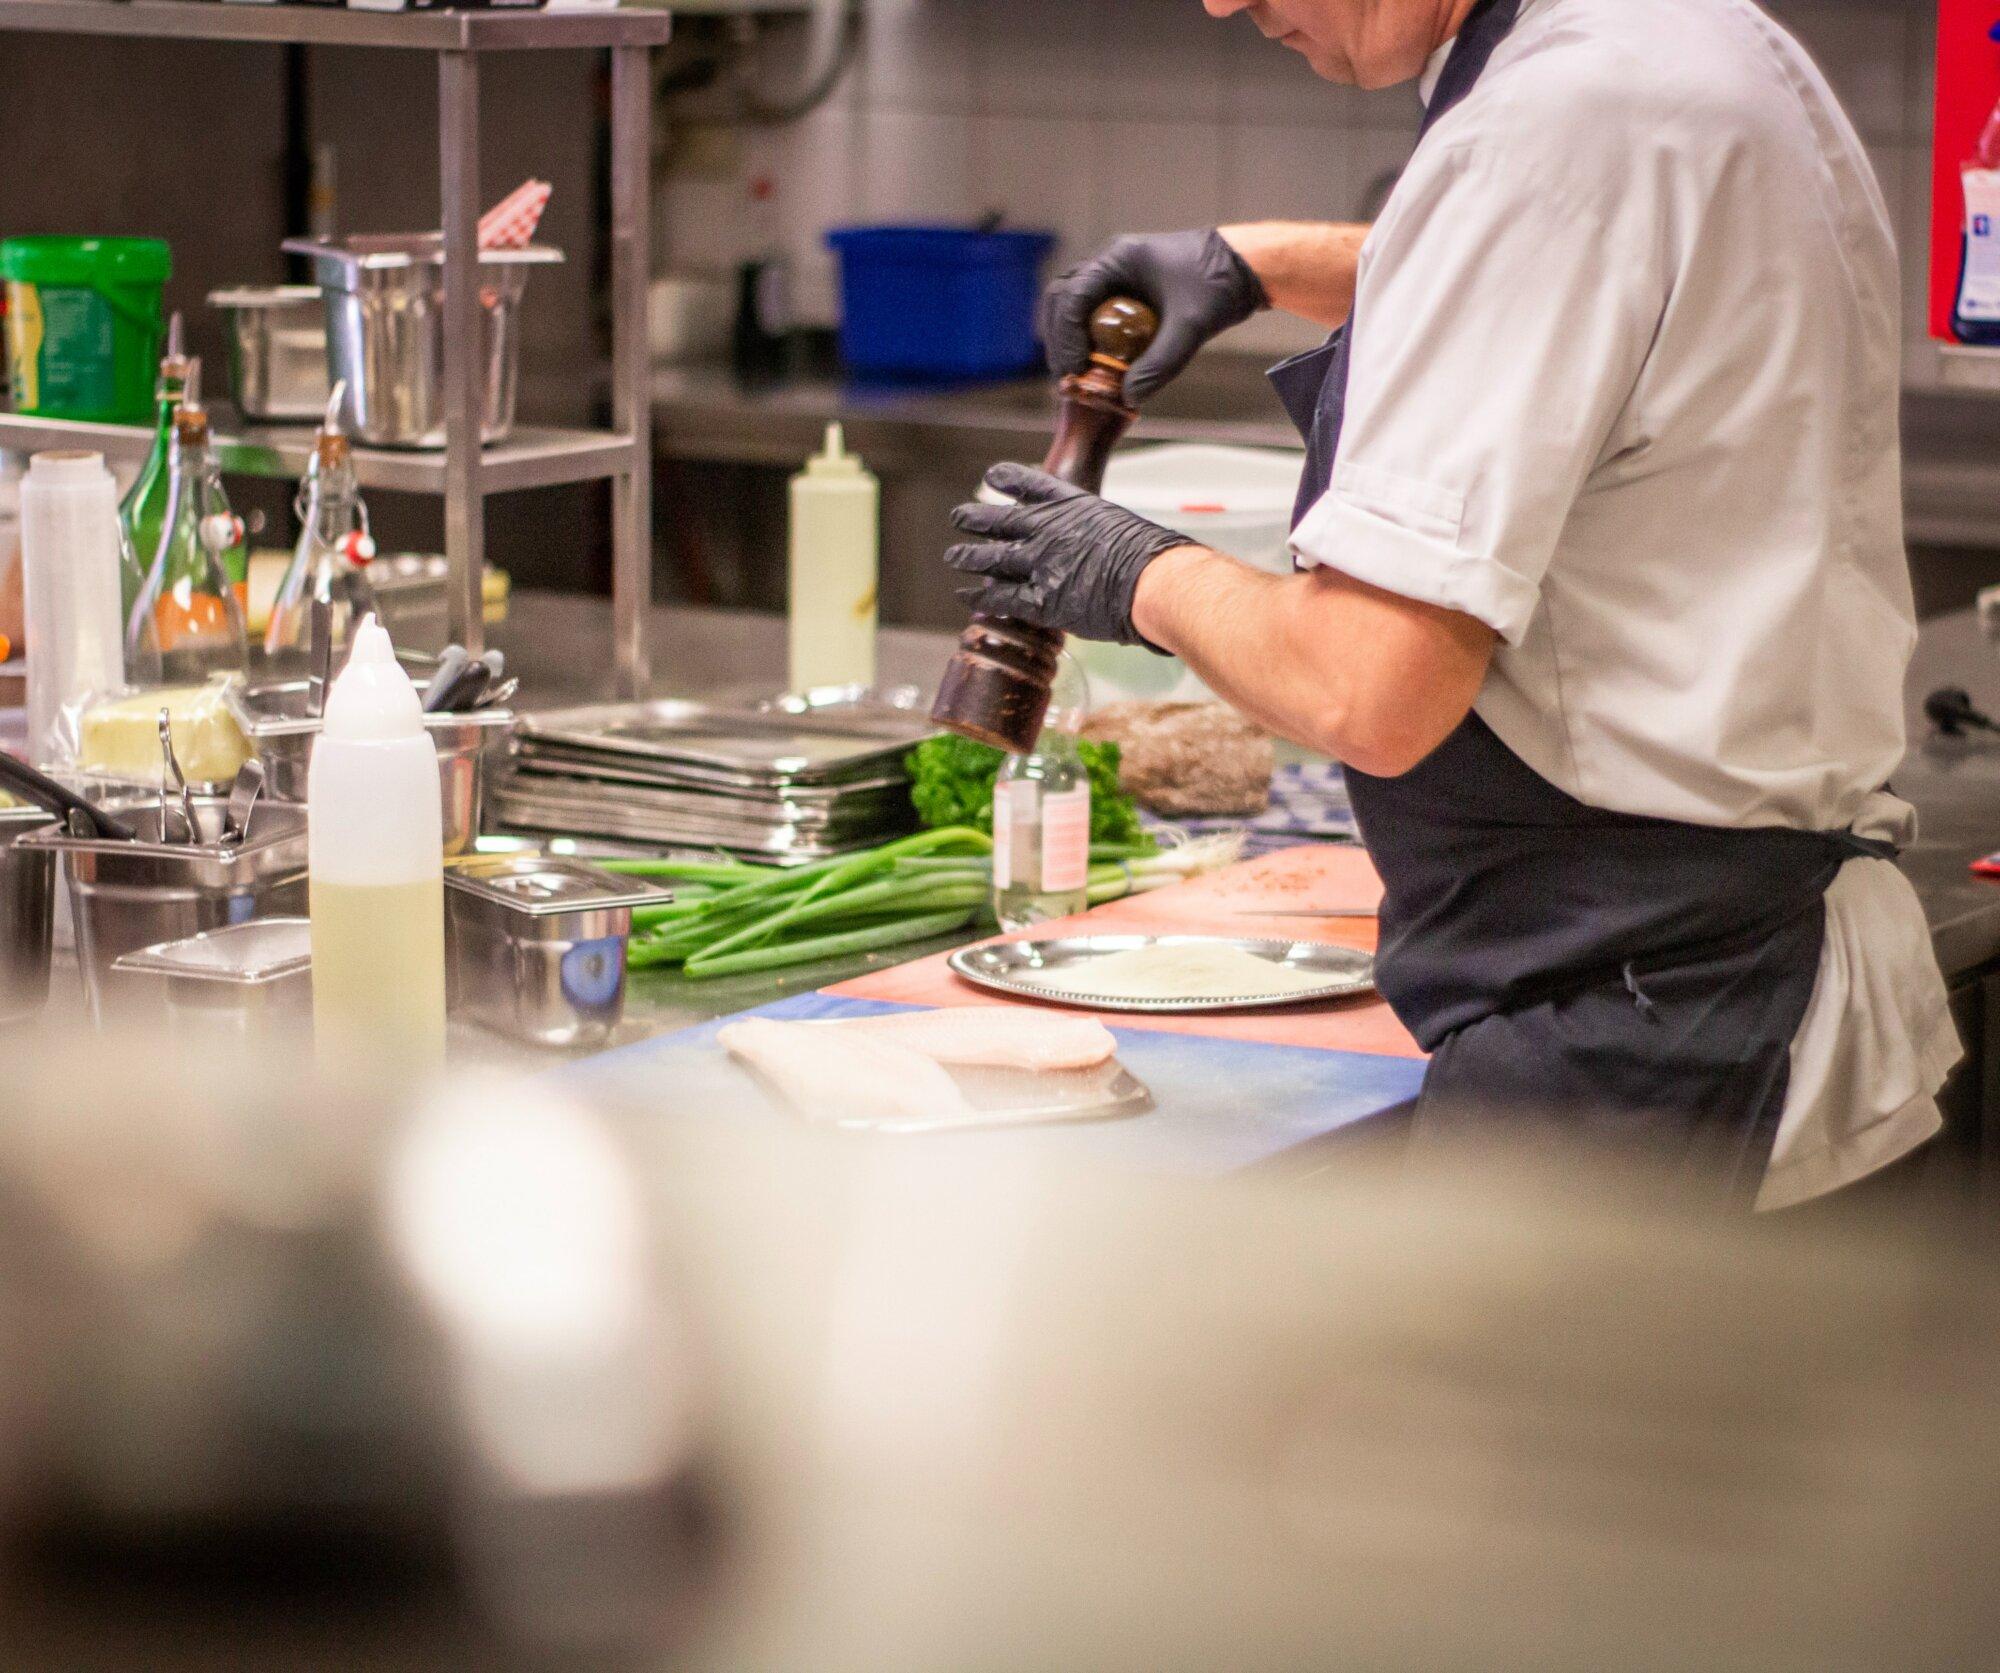 Enthousiaste keukenhulp (freelance/flexi/student) – Trendy cateringbedrijf (Gent)